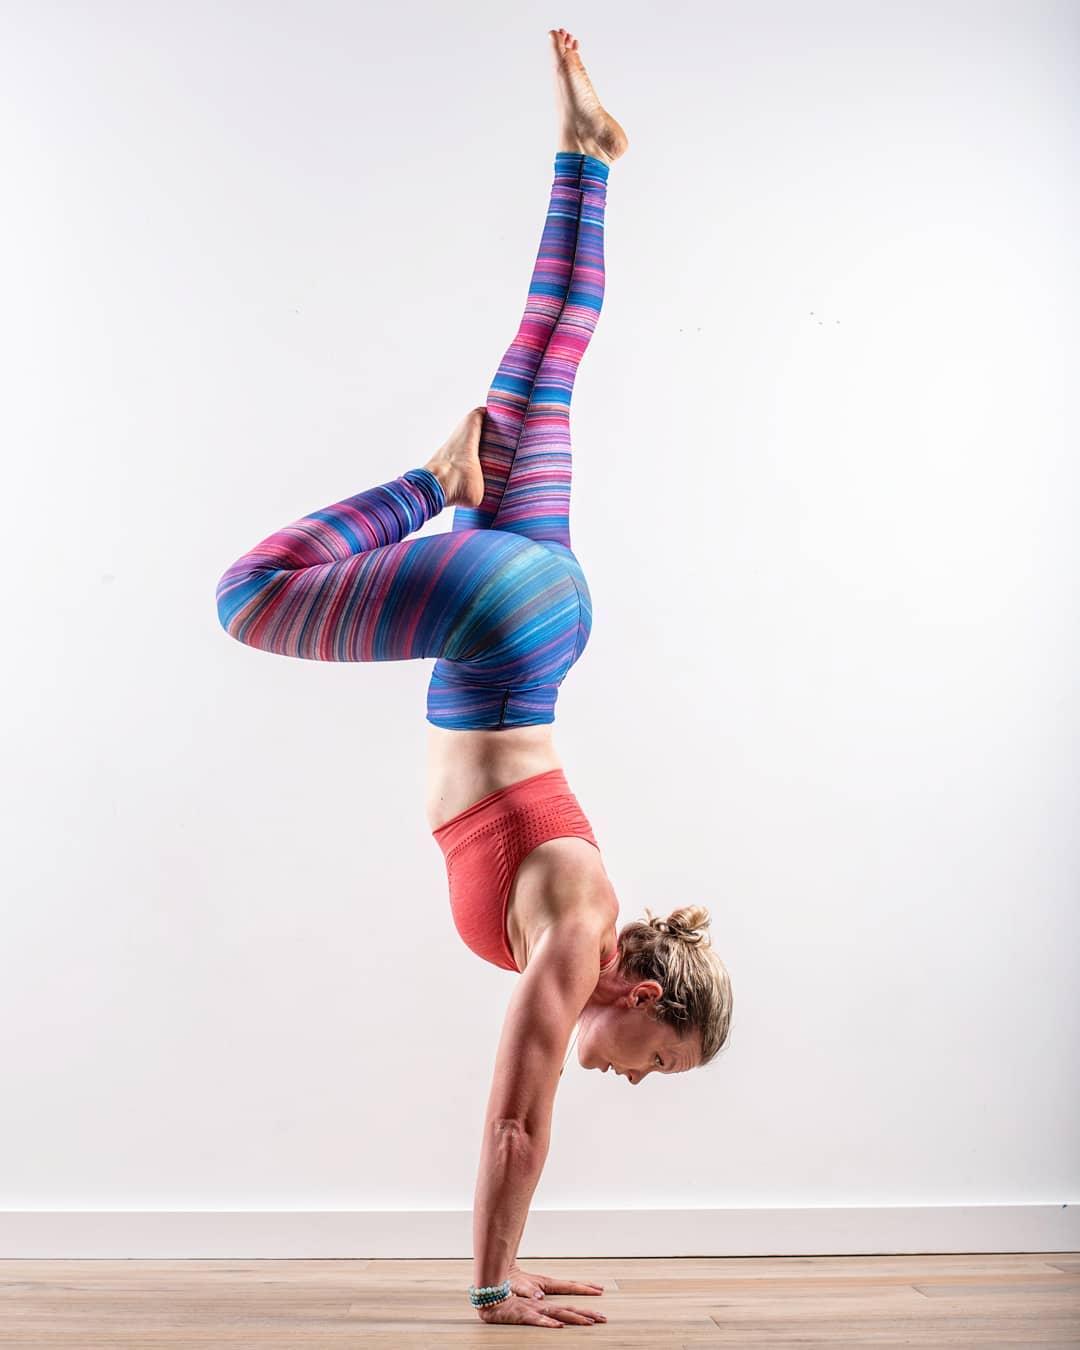 Katy Gassaway Yoga Pose by Weston Carls.jpg